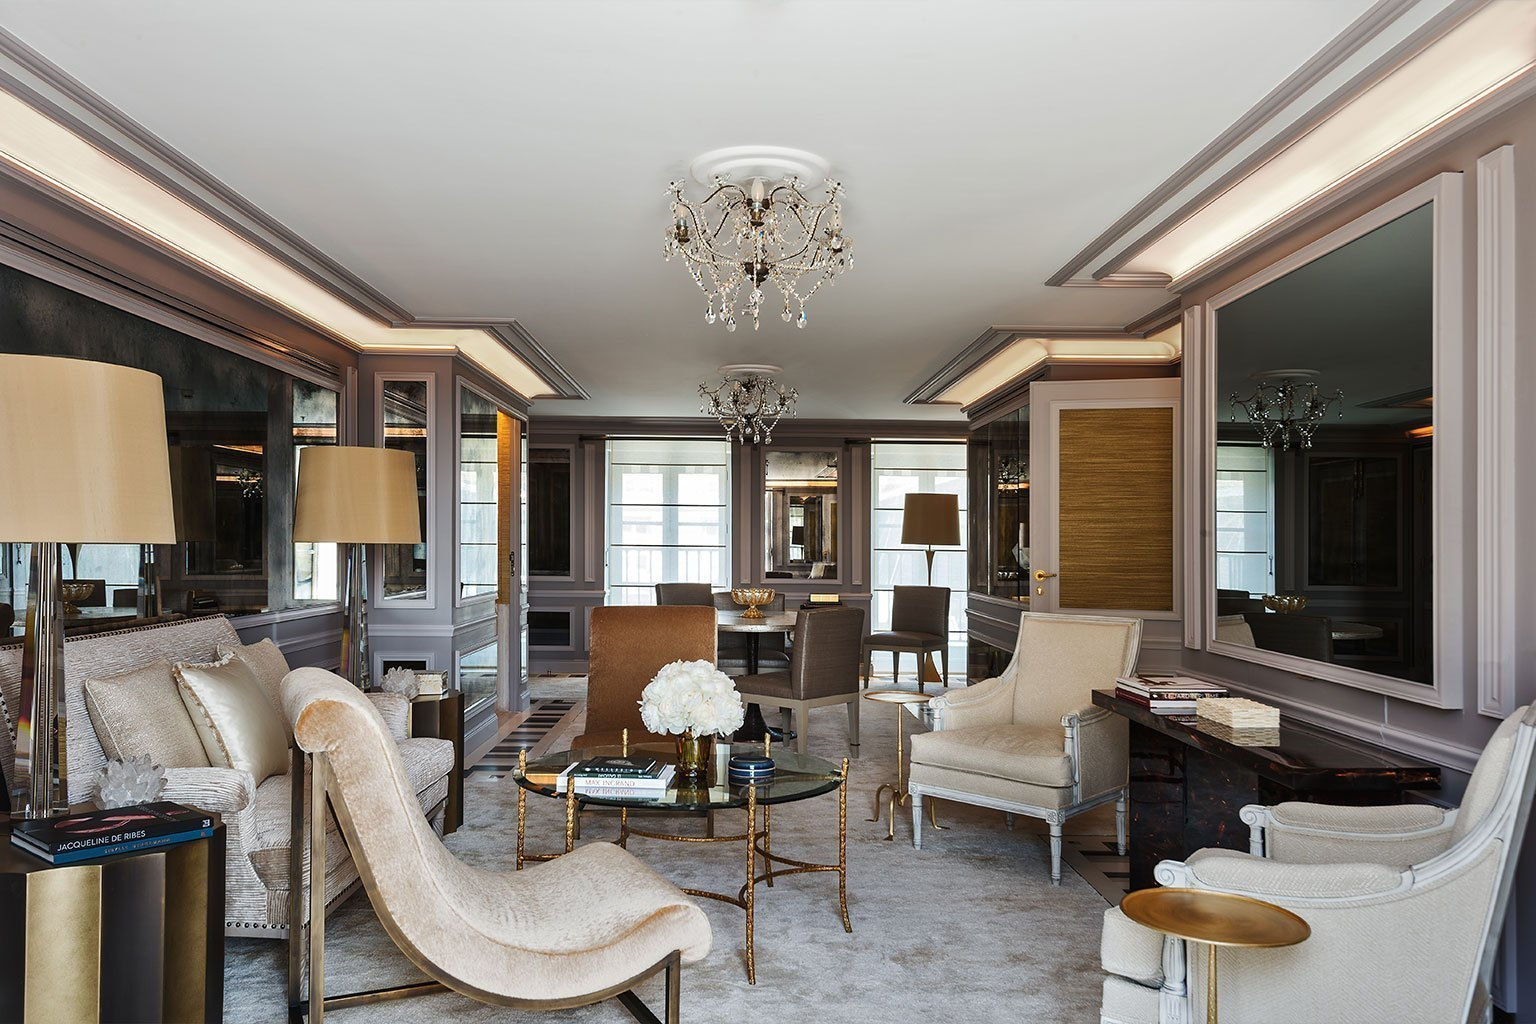 Hotel De Crillon A Rosewood Hotel Luxushotel Bei Designreisen